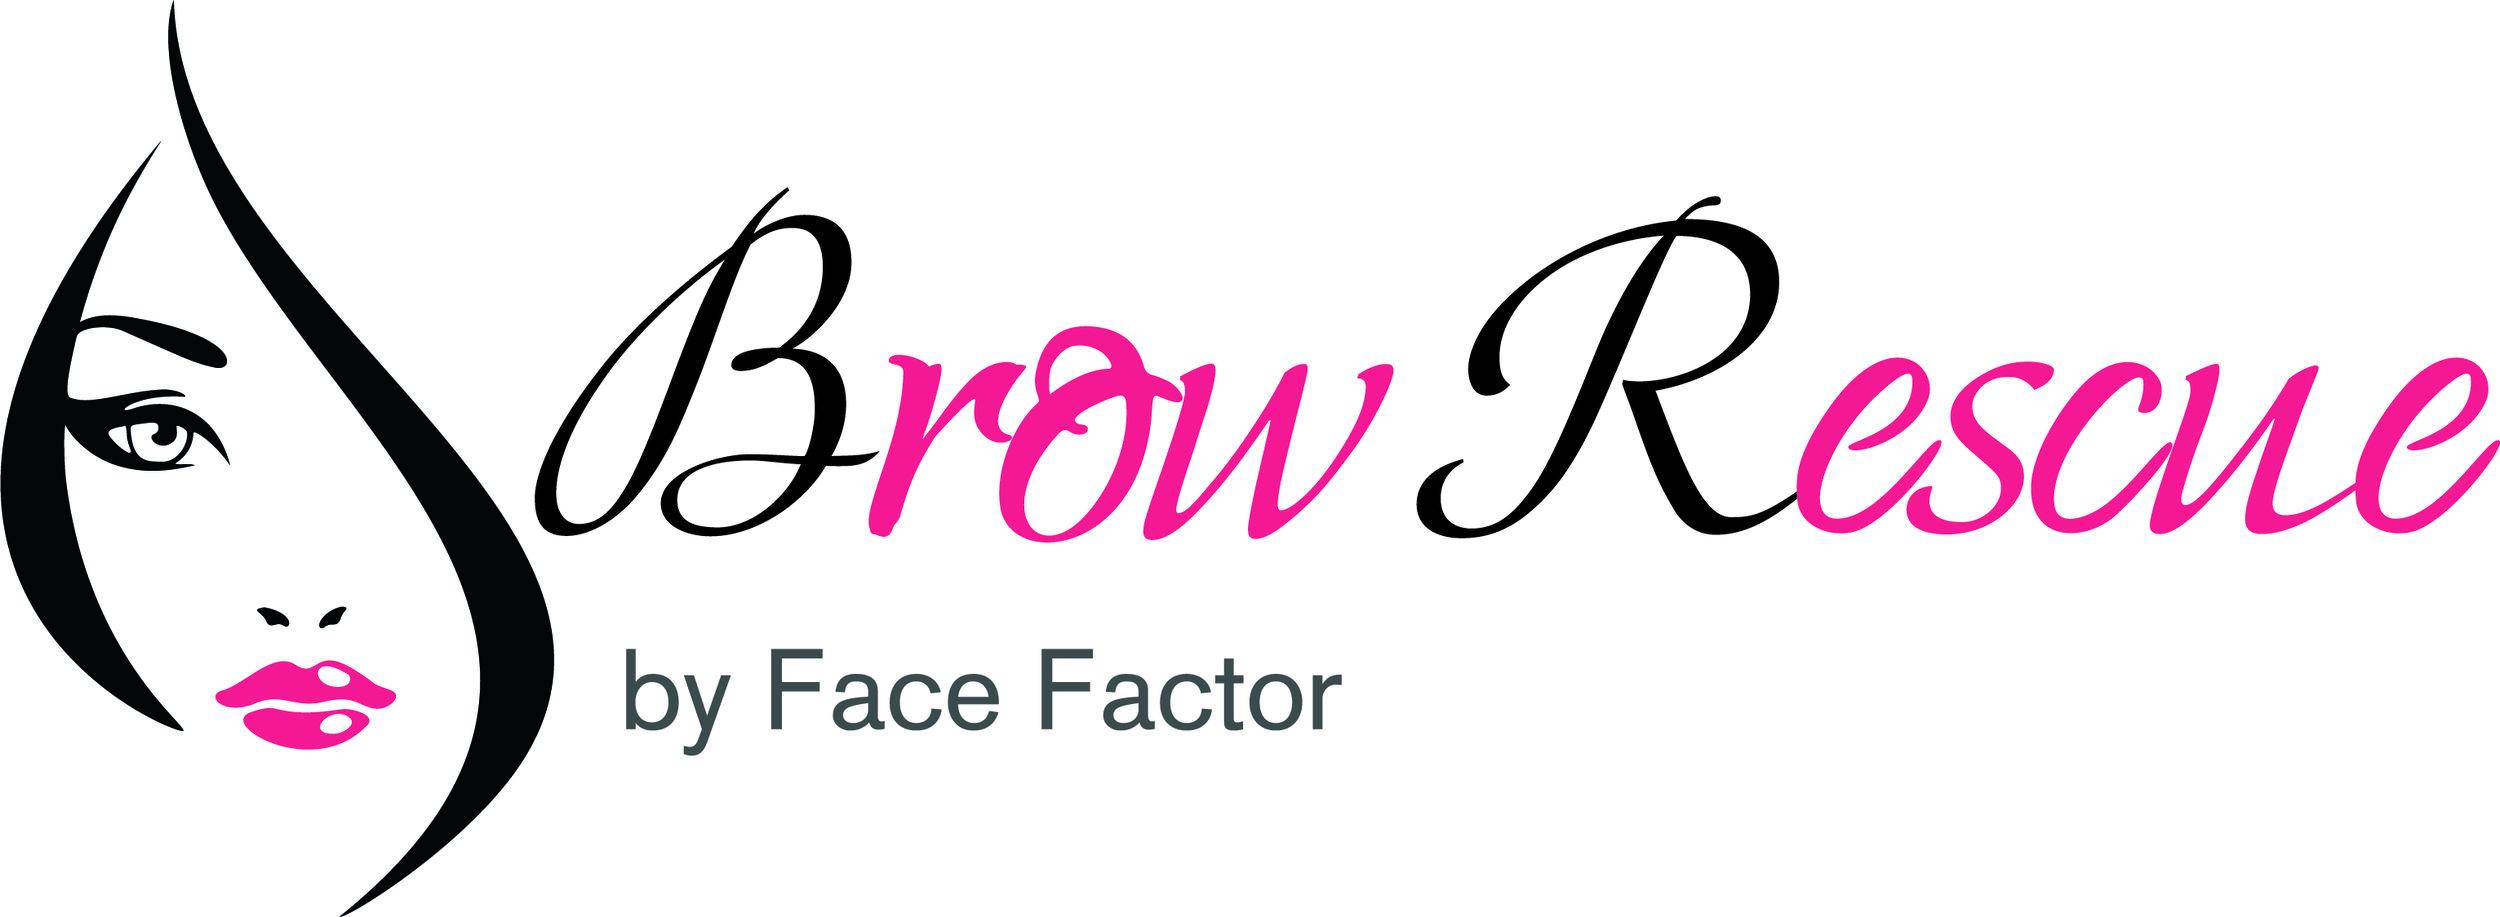 Brow Rescue Logo_FINAL.jpg